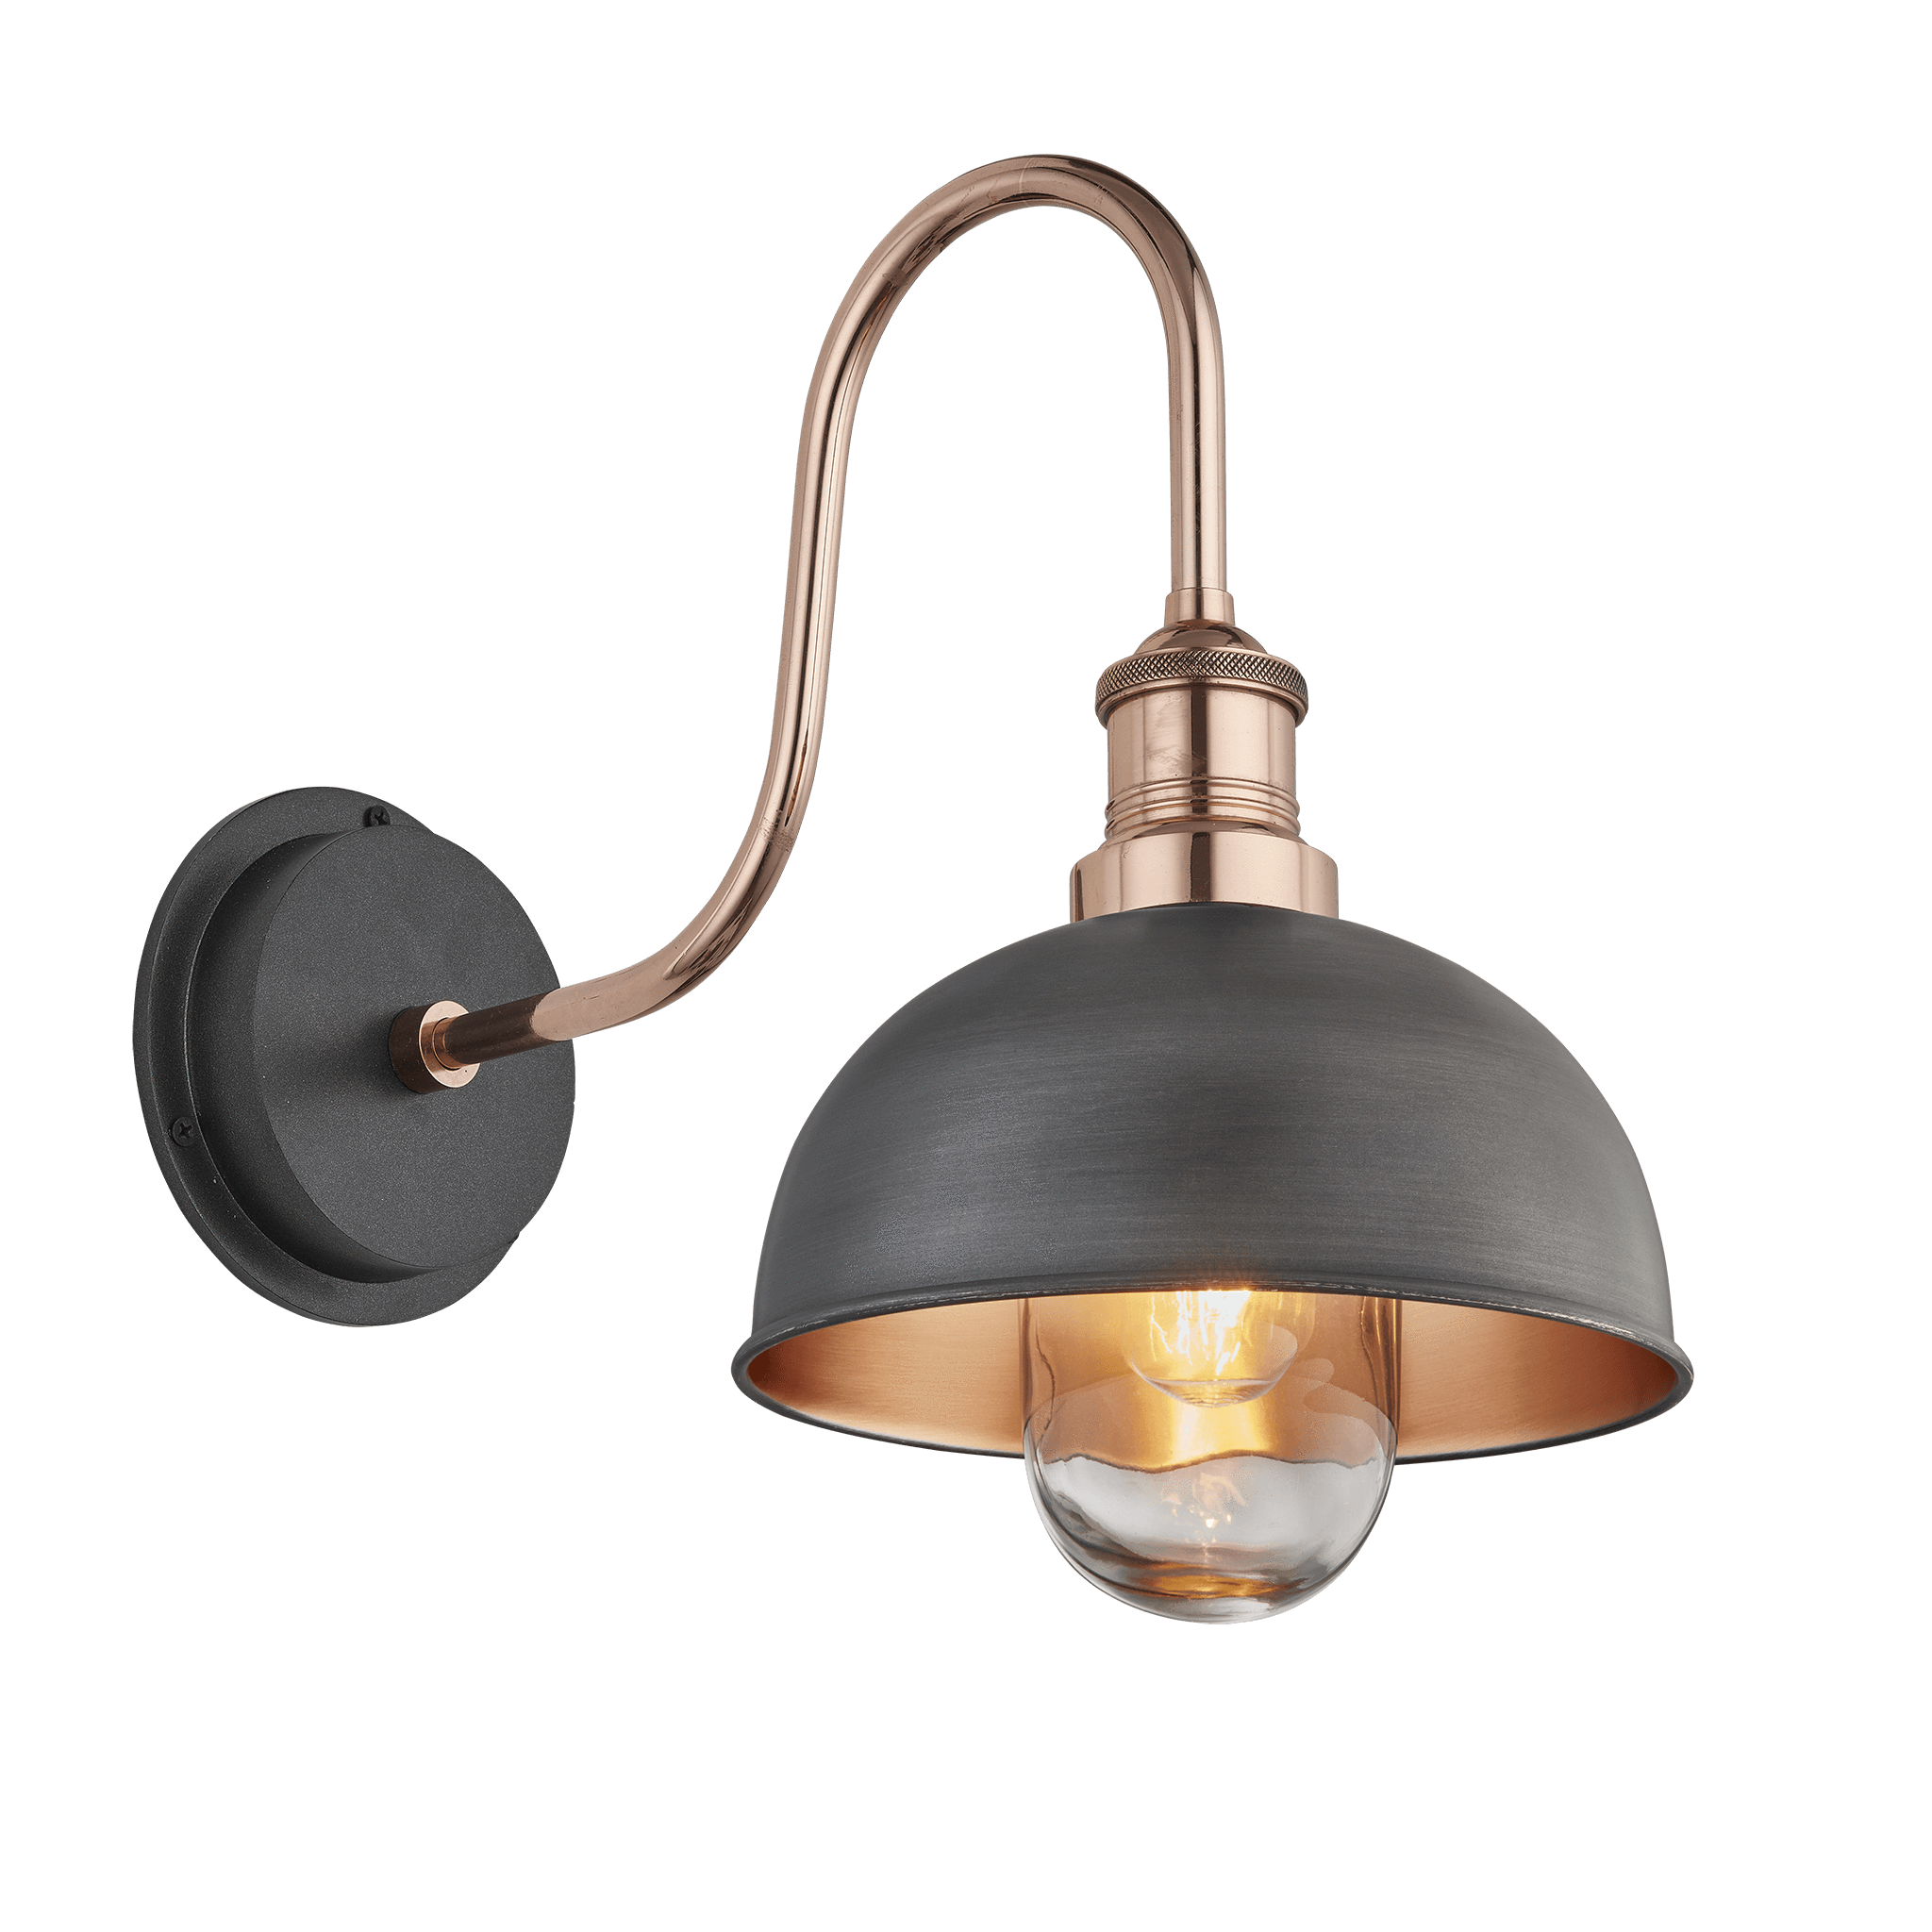 Swan Neck Outdoor Bathroom Dome Wall Light 8 Inch Pewter Copper In 2020 Wall Lights Outdoor Bathrooms Copper Wall Light